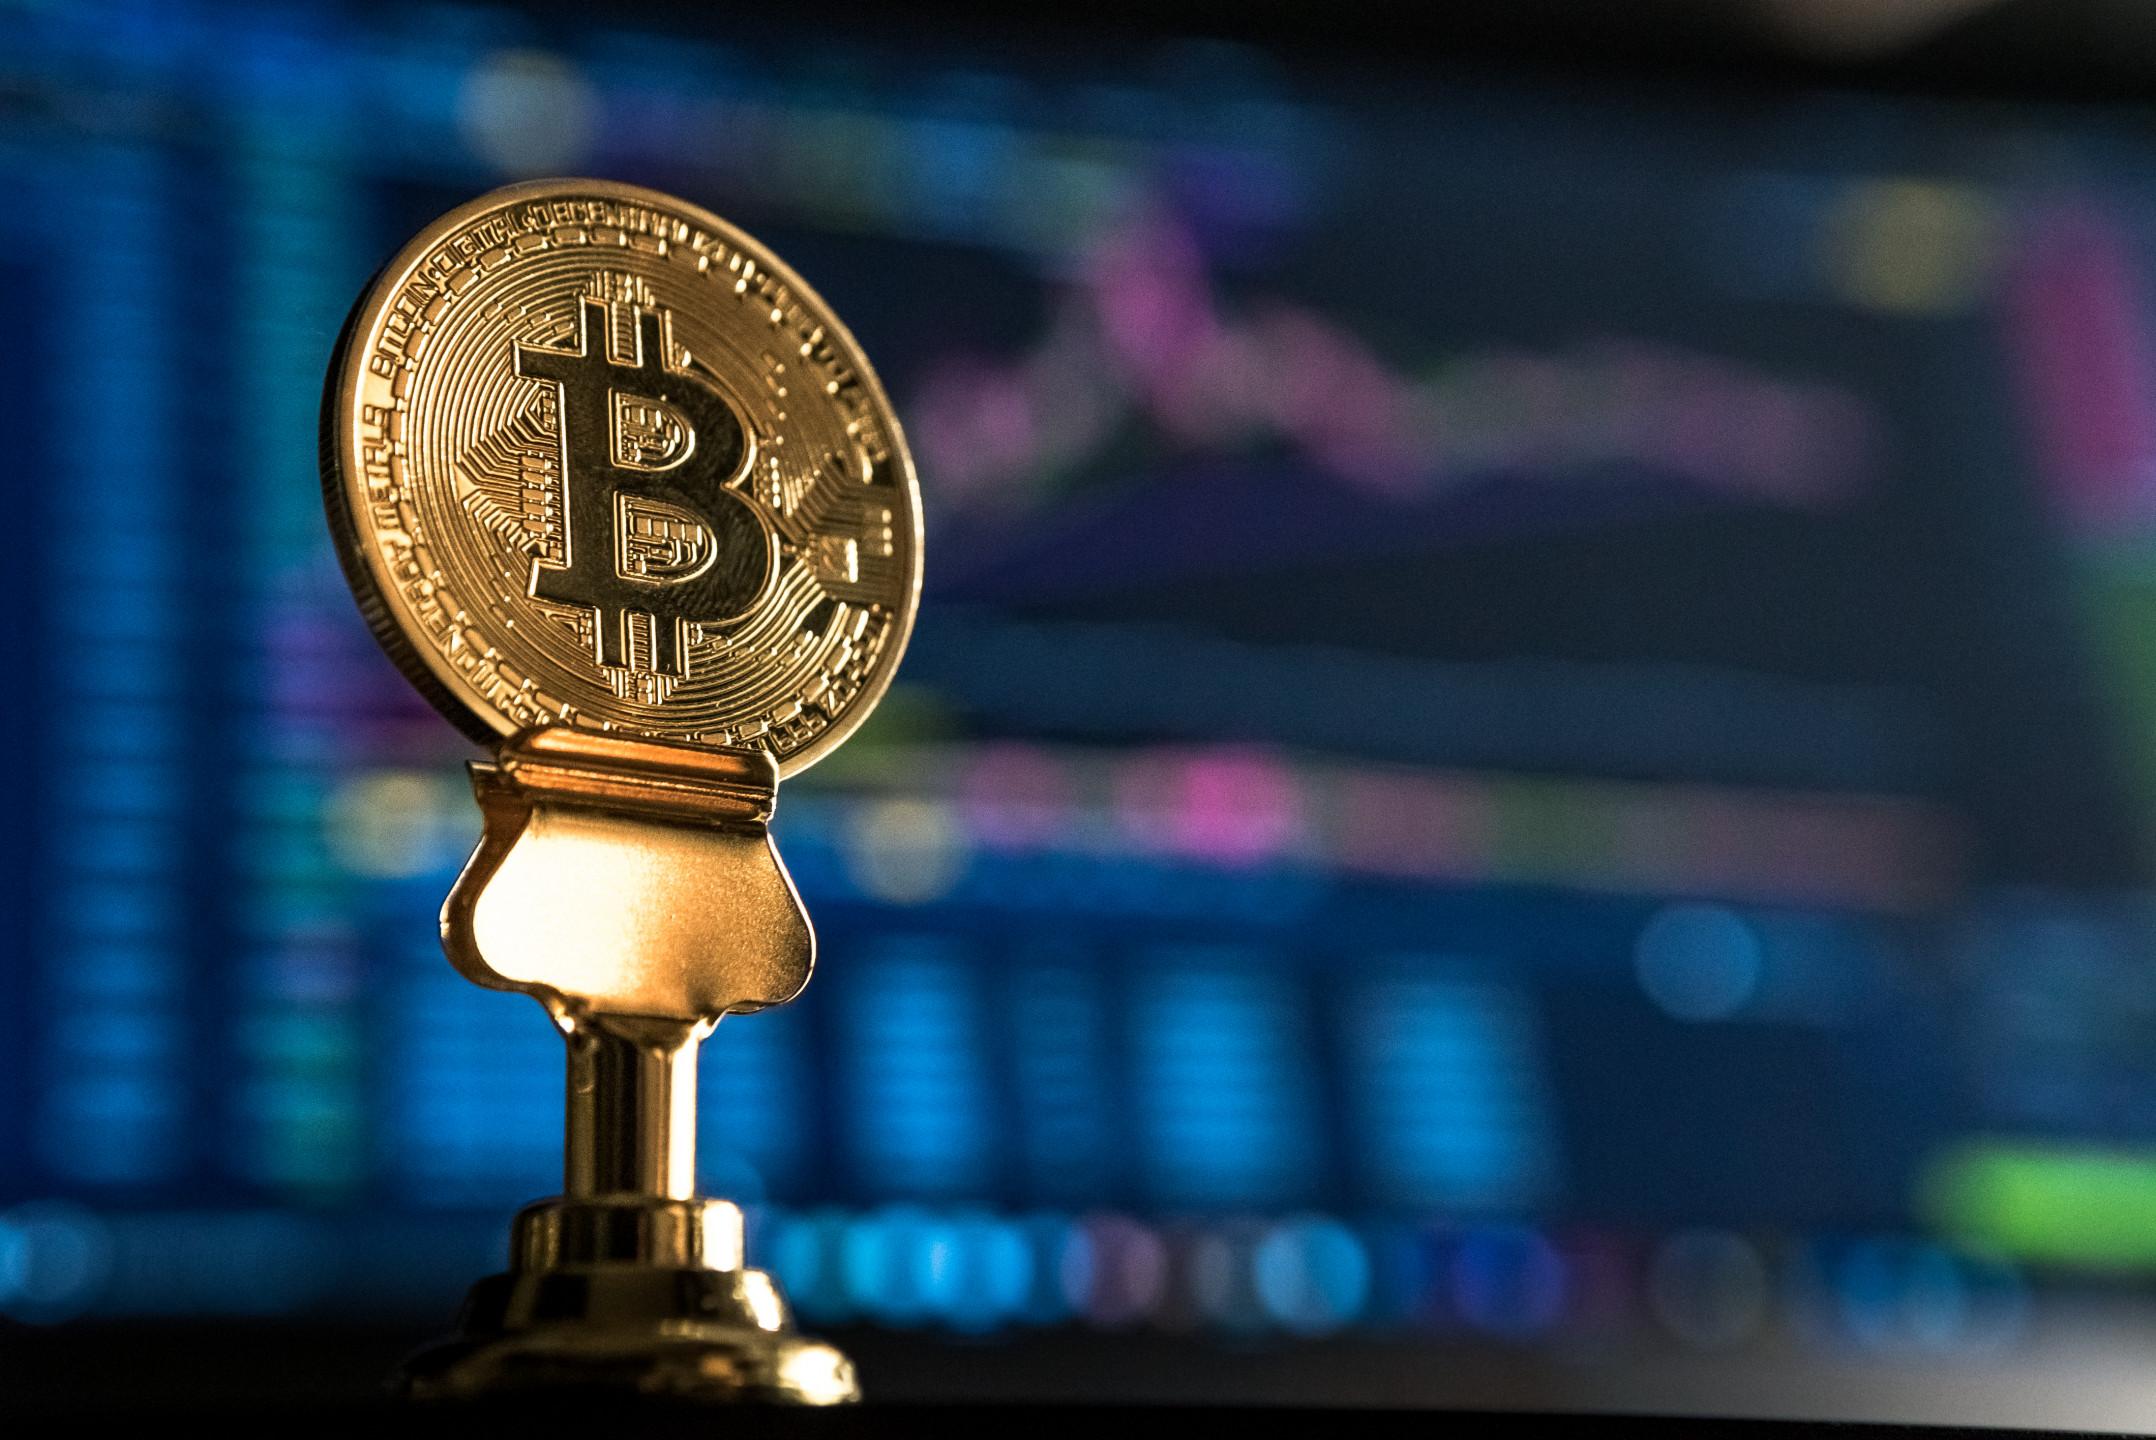 Bitcoin Reveal Report: Another Fake Satoshi Nakamato Announcement?